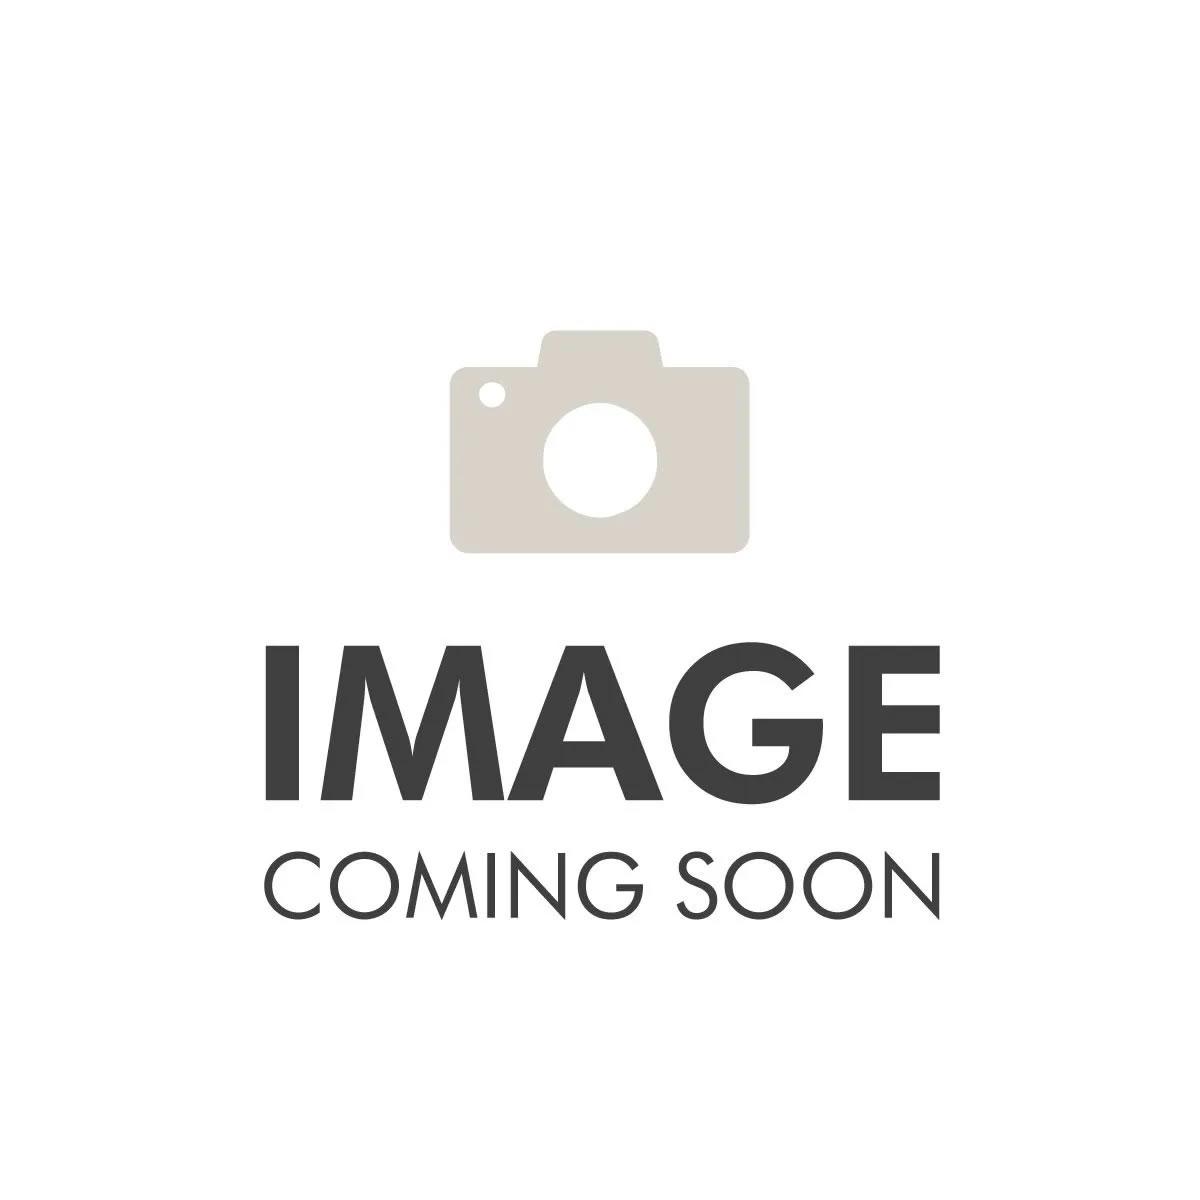 Wiring Harness, w/ Turn Signal; 46-49 Willys CJ2A